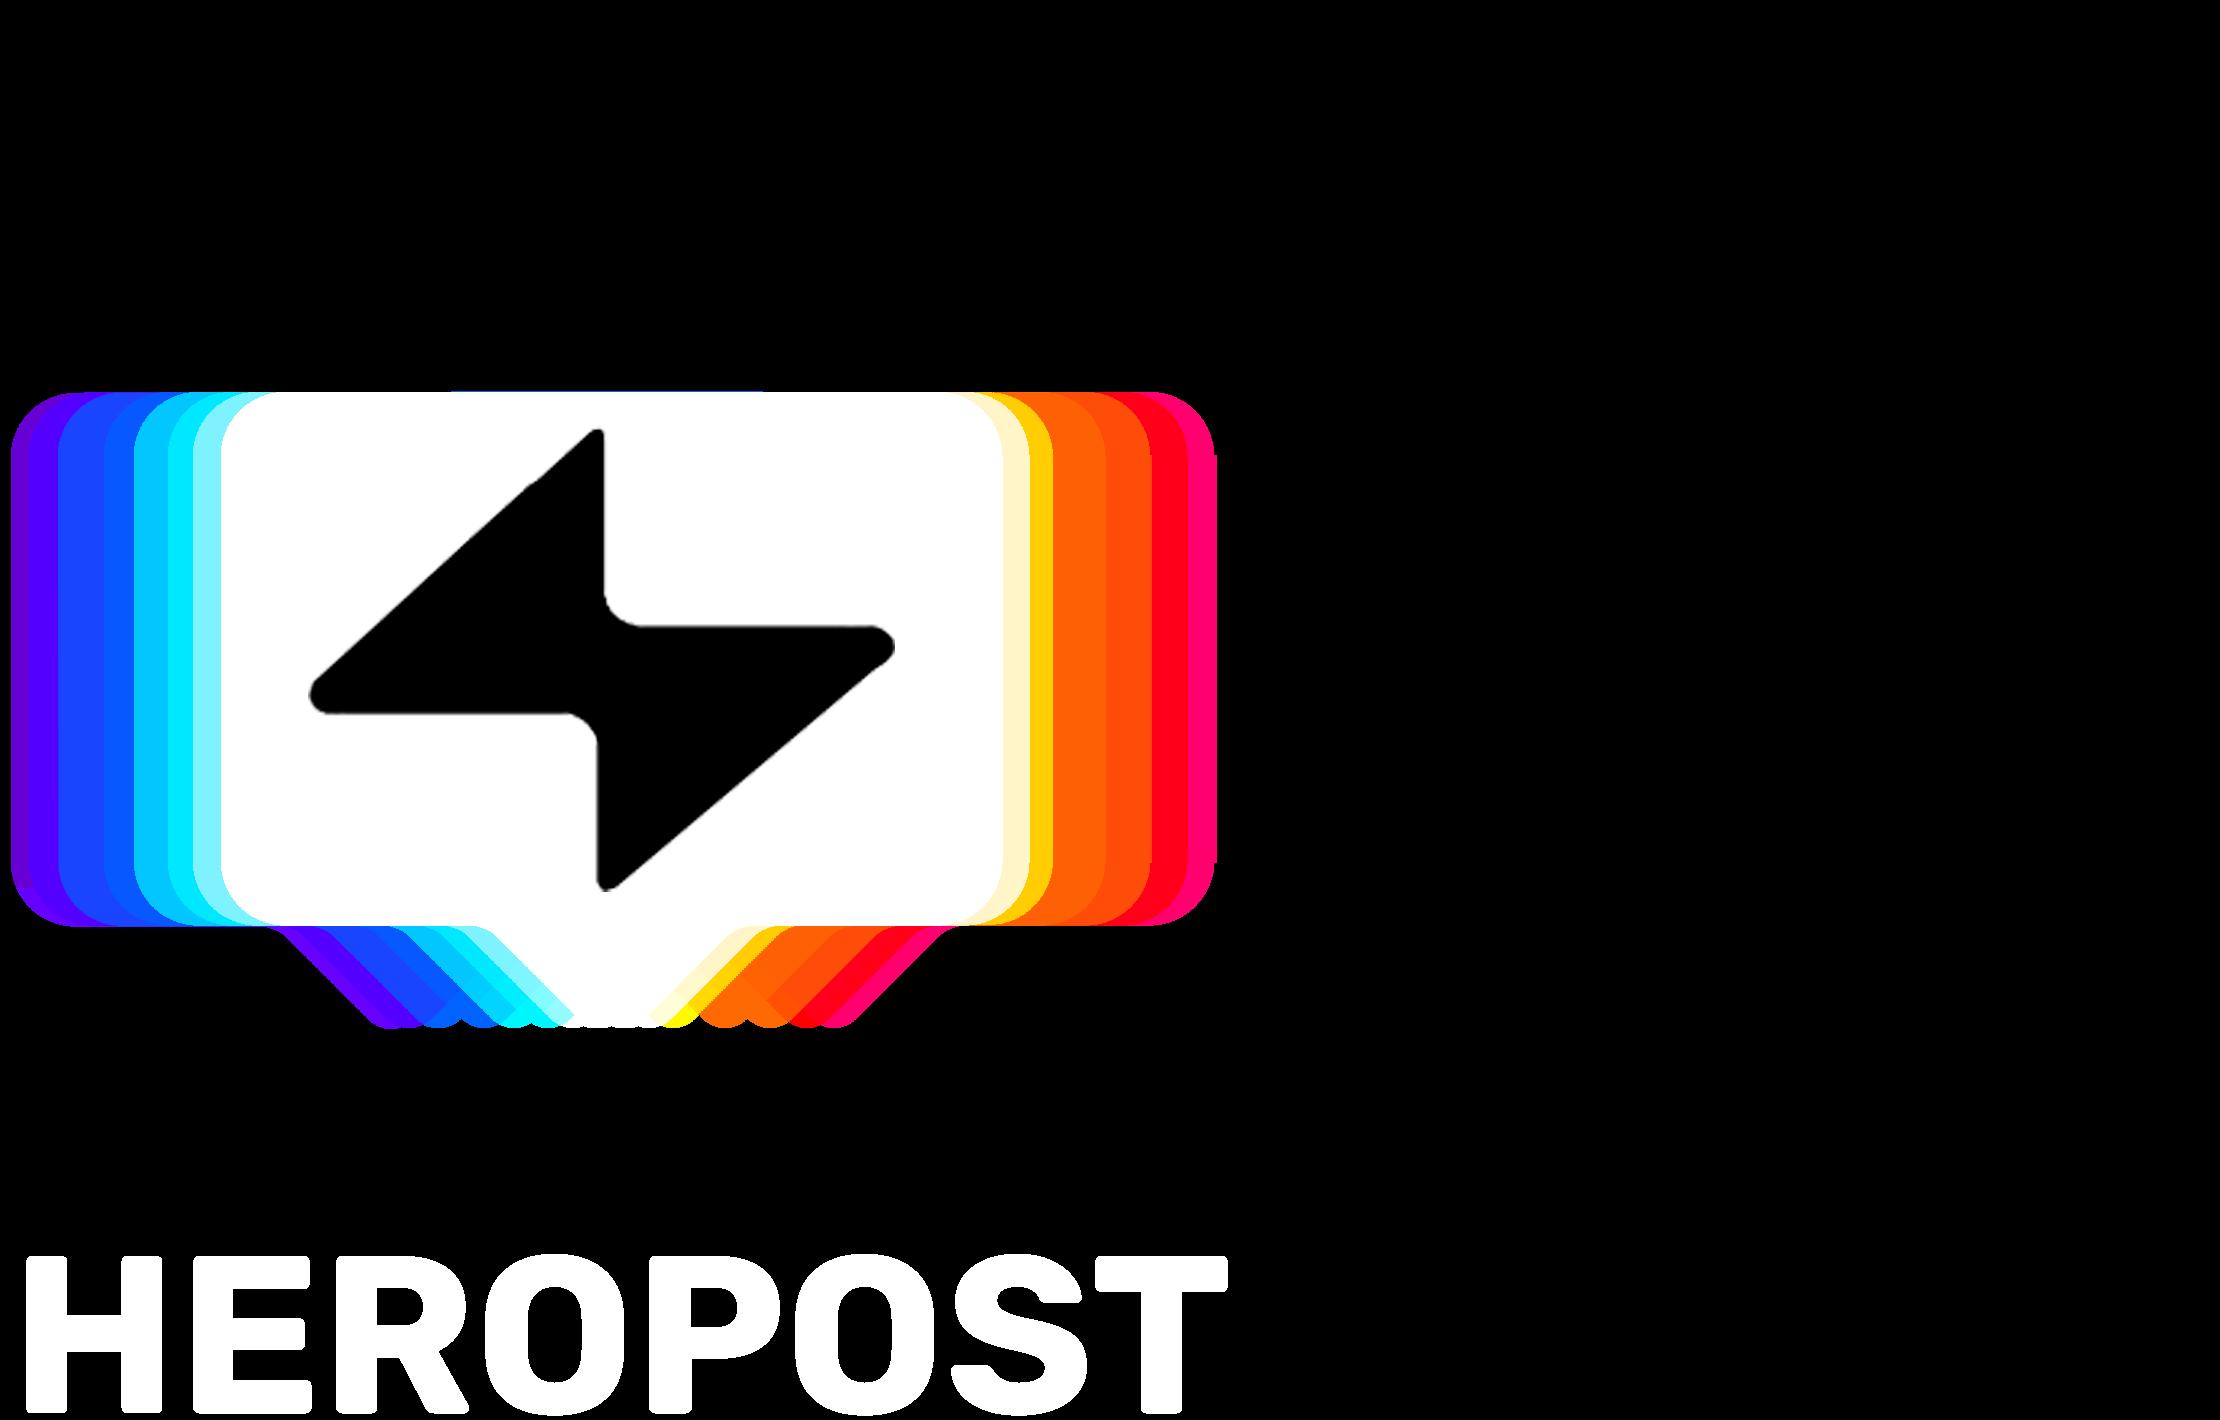 Heropost